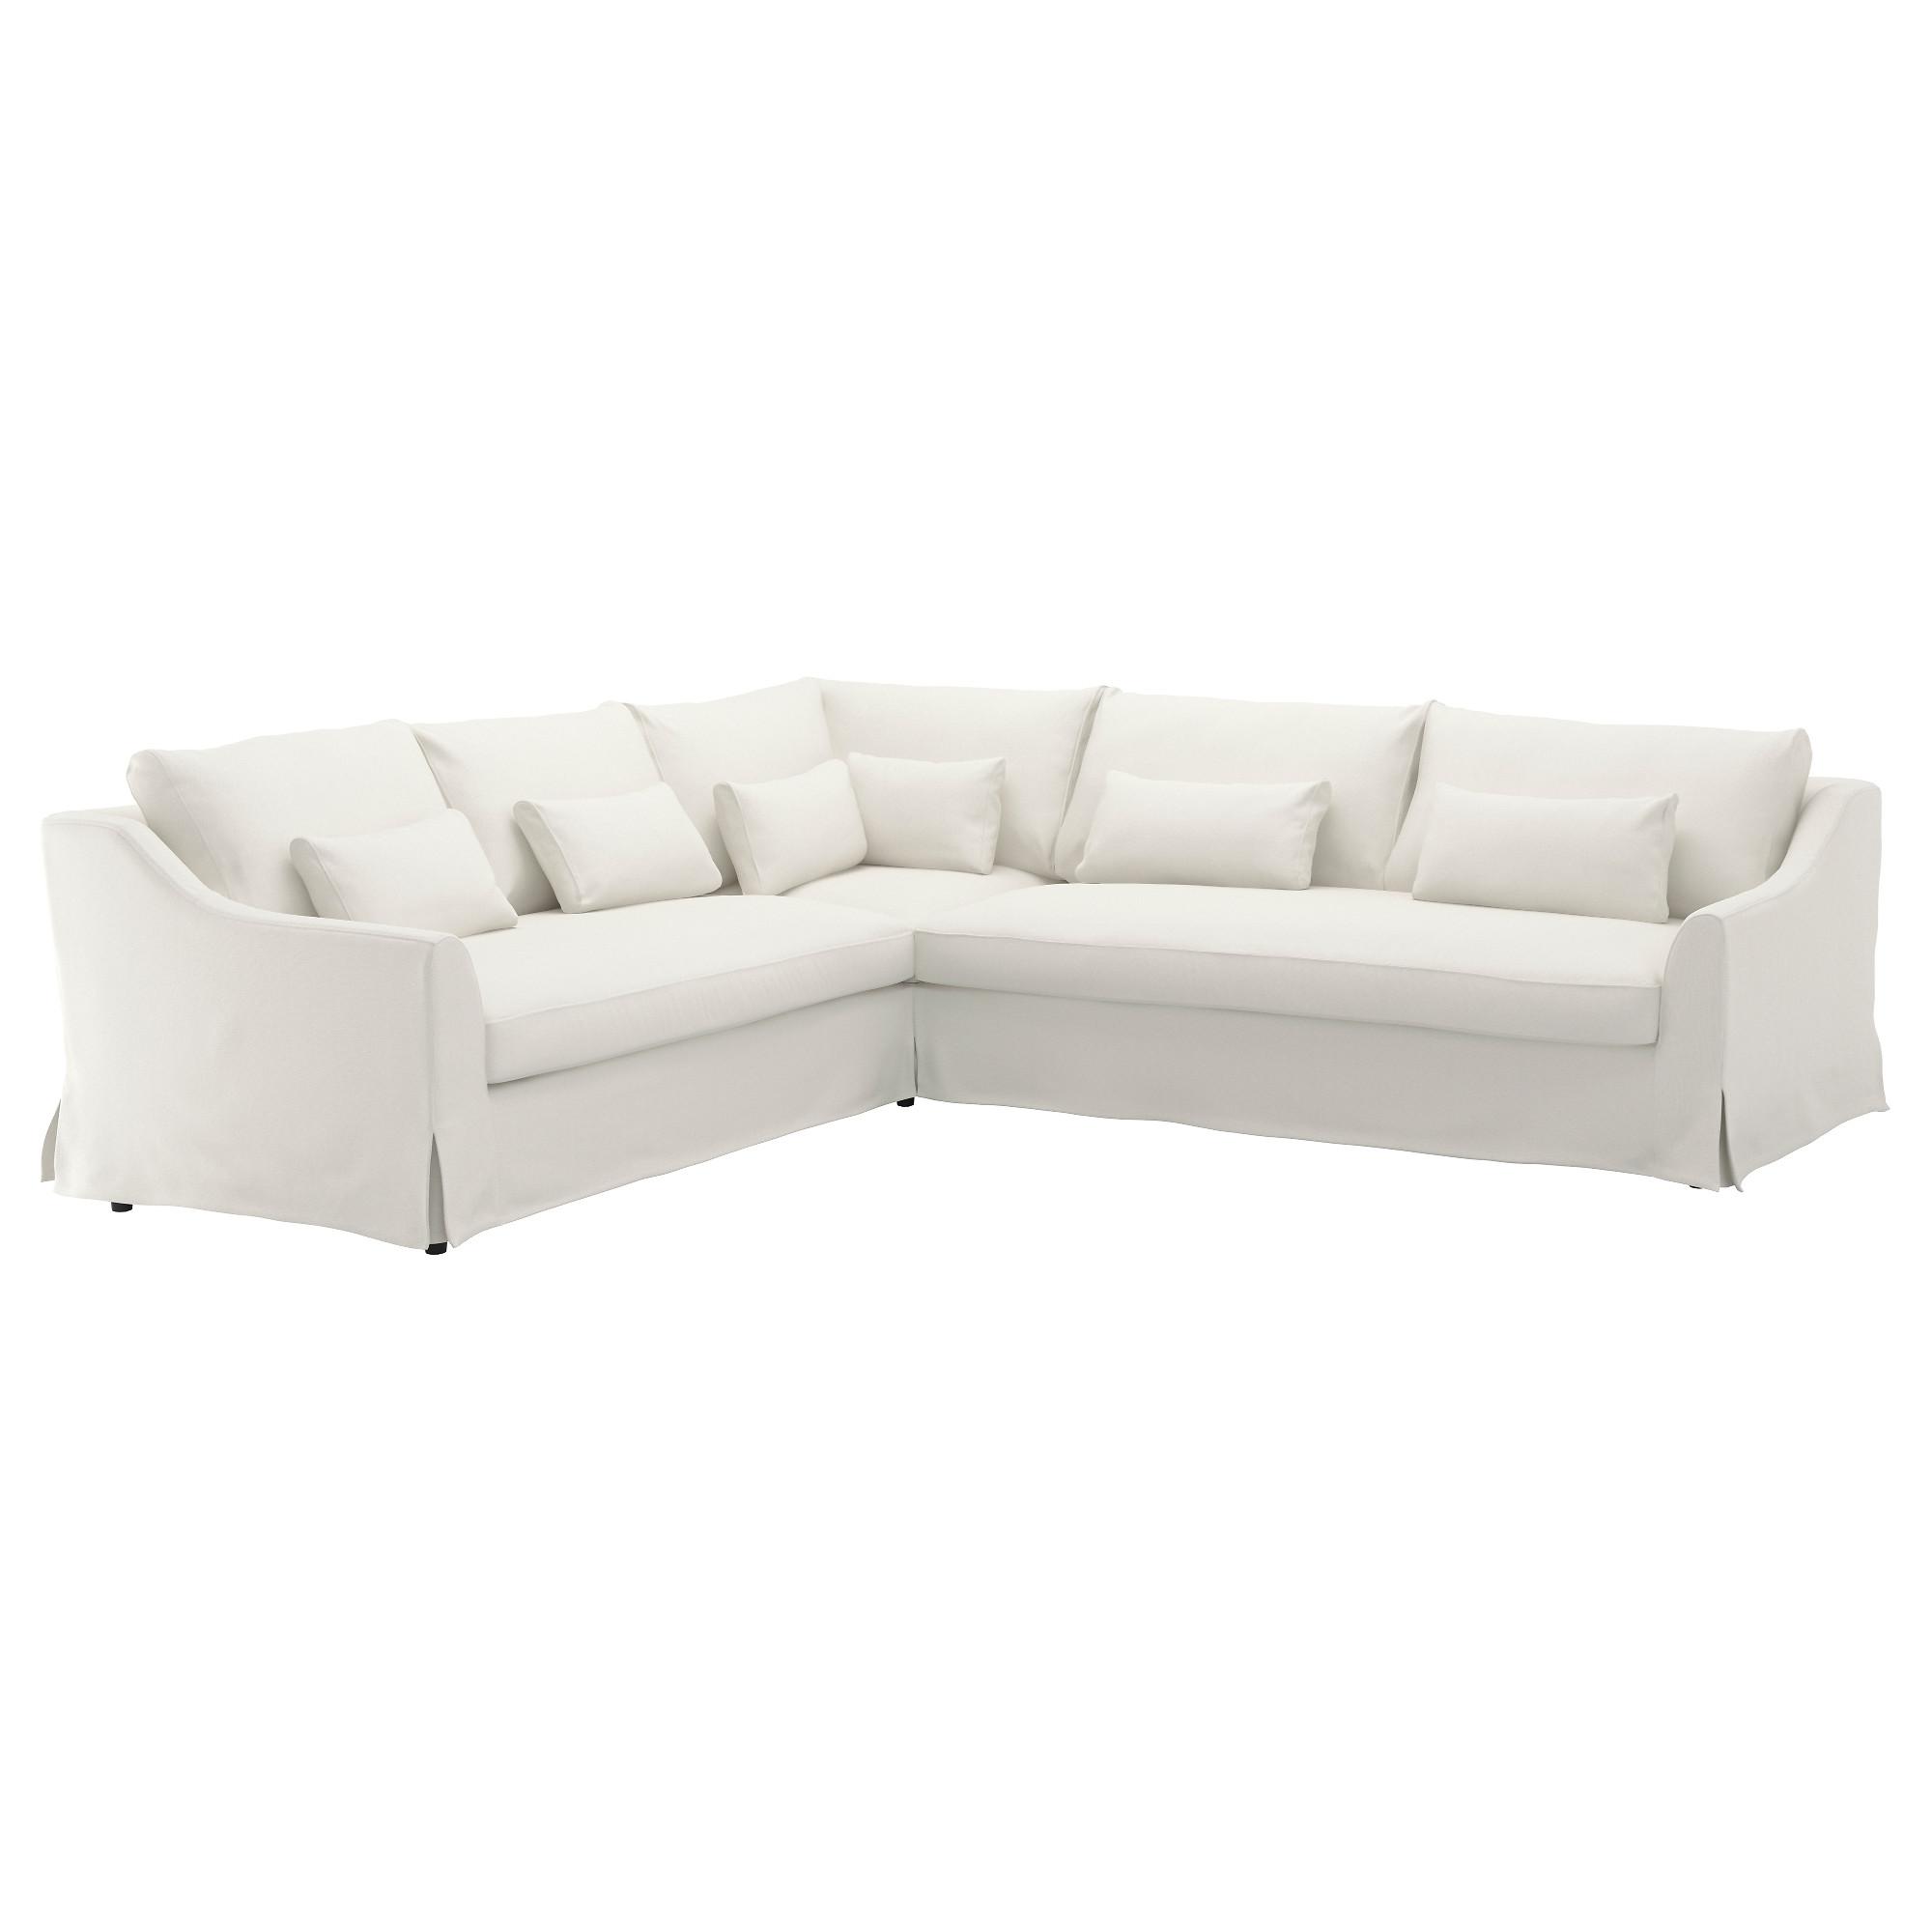 Image Result For White Frame With Navy Cushion Sofas Orange